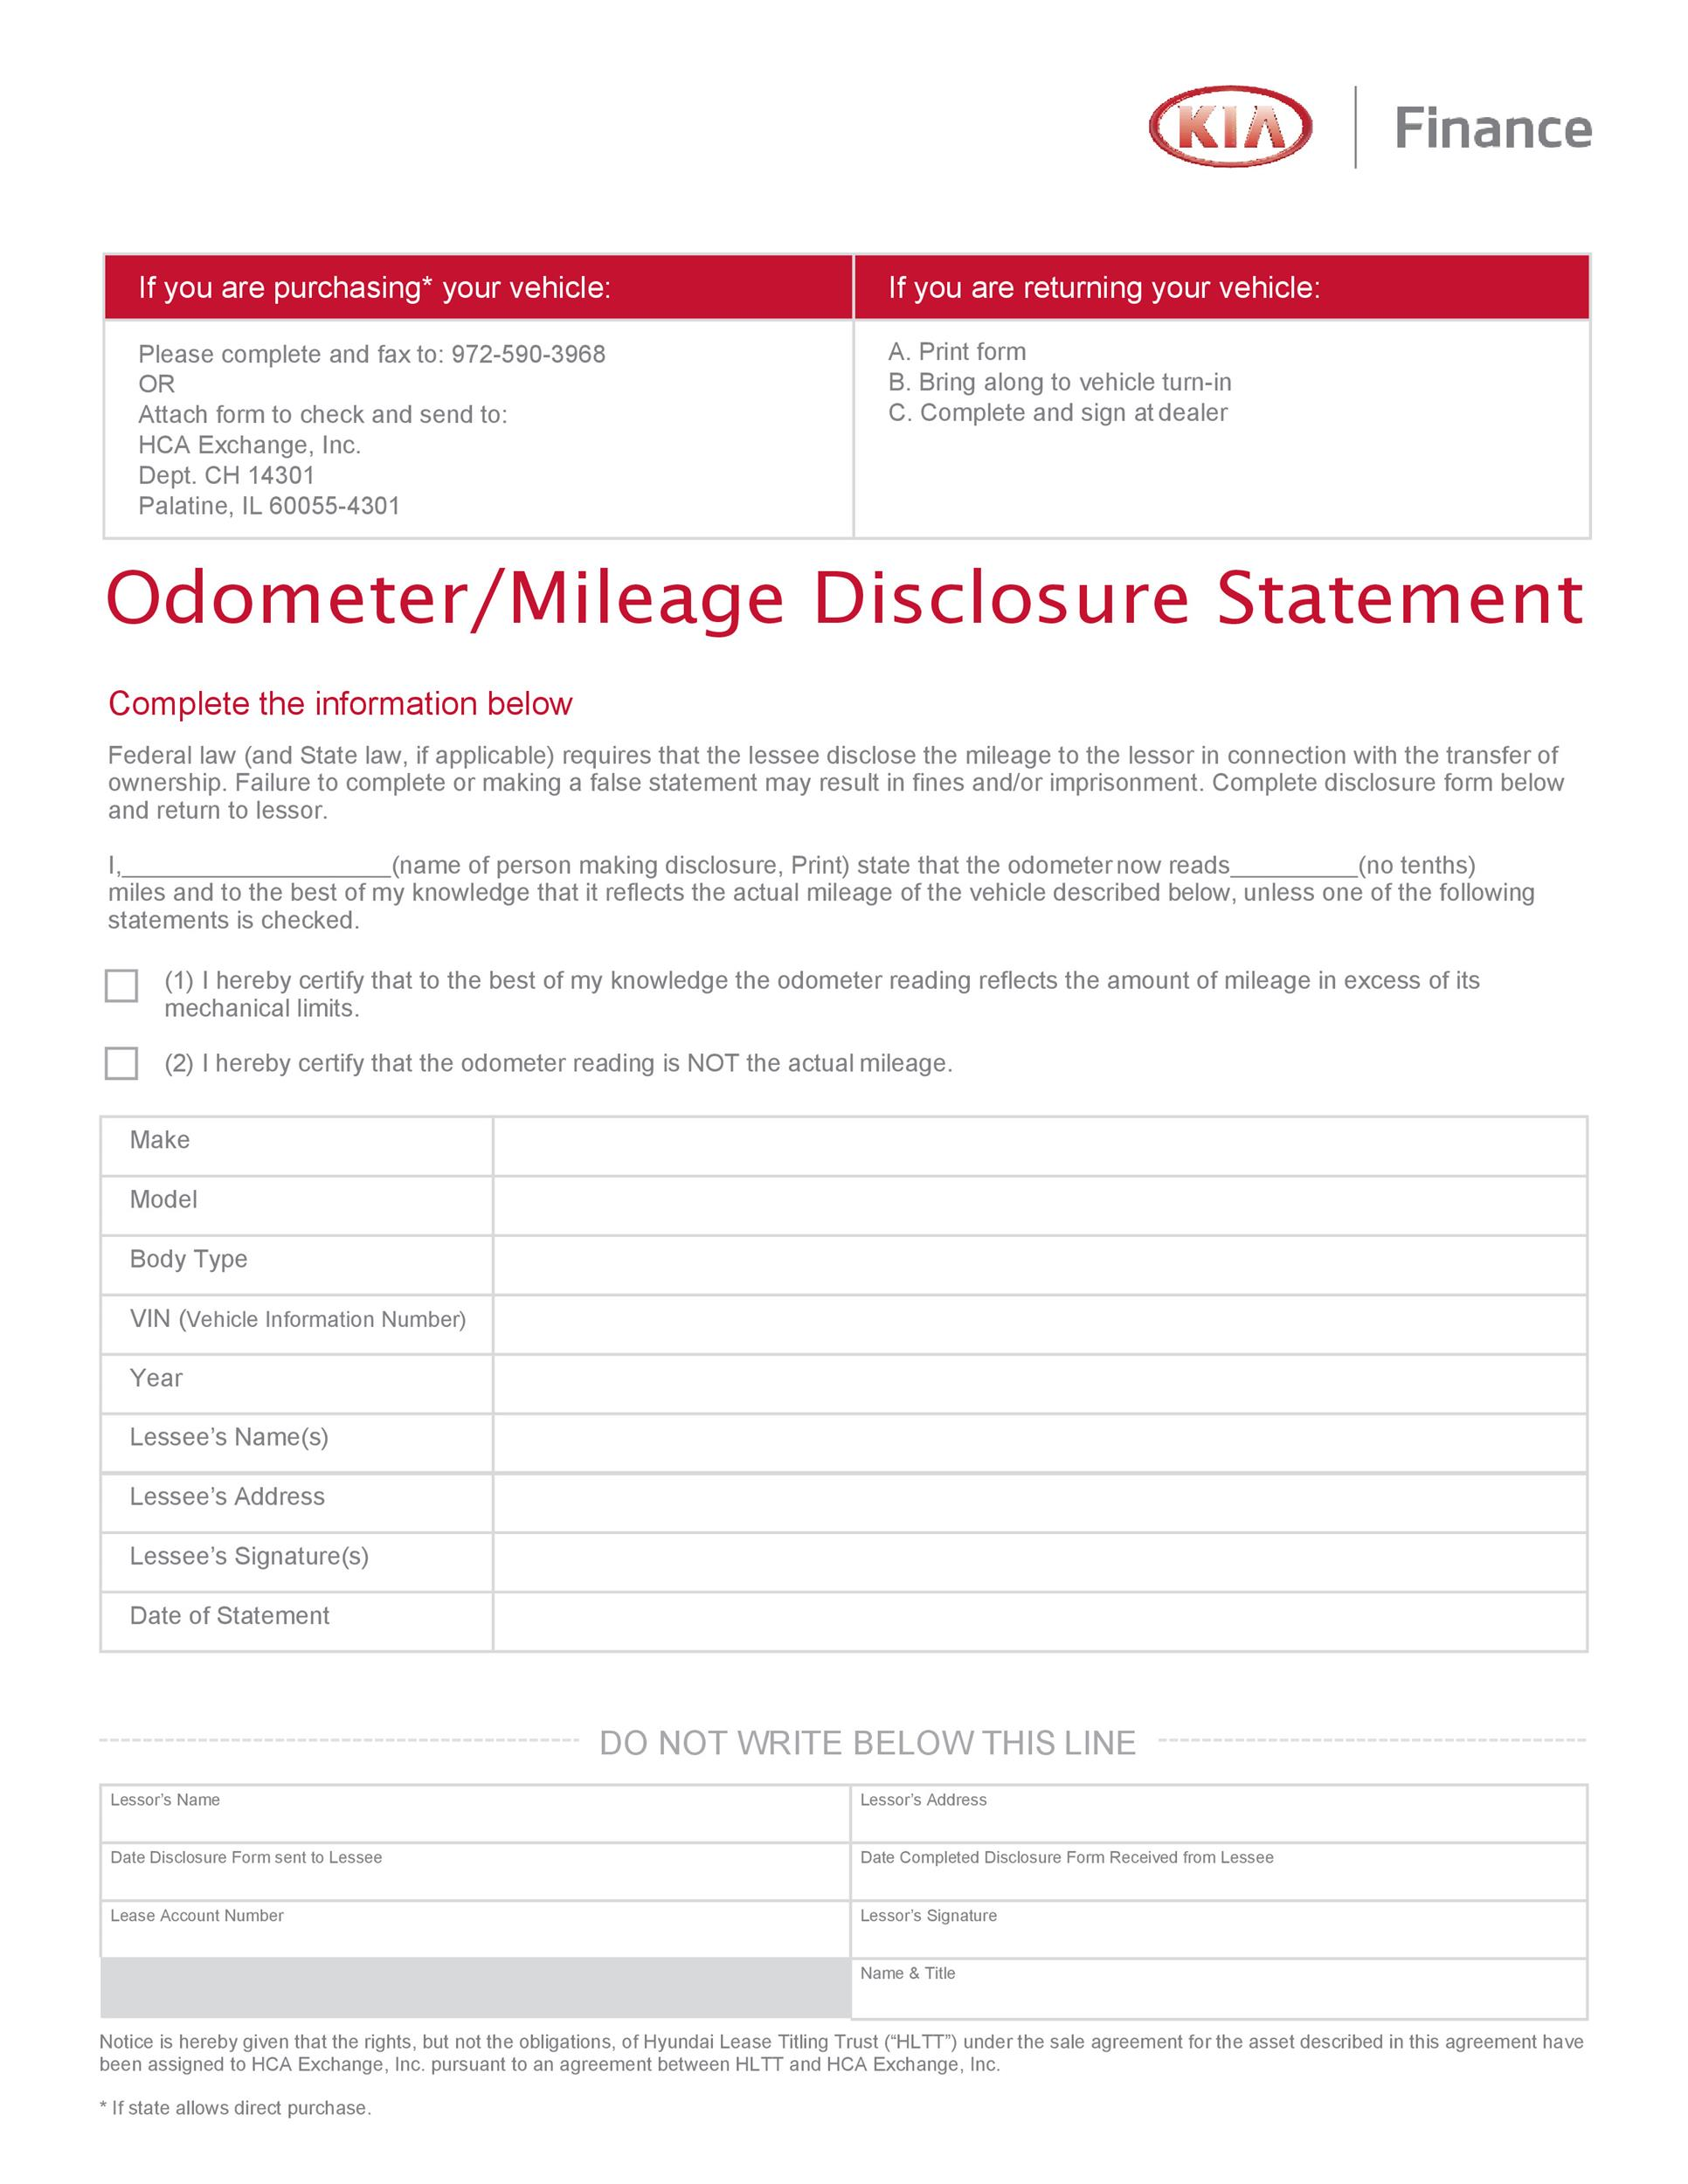 Free odometer disclosure statement 35